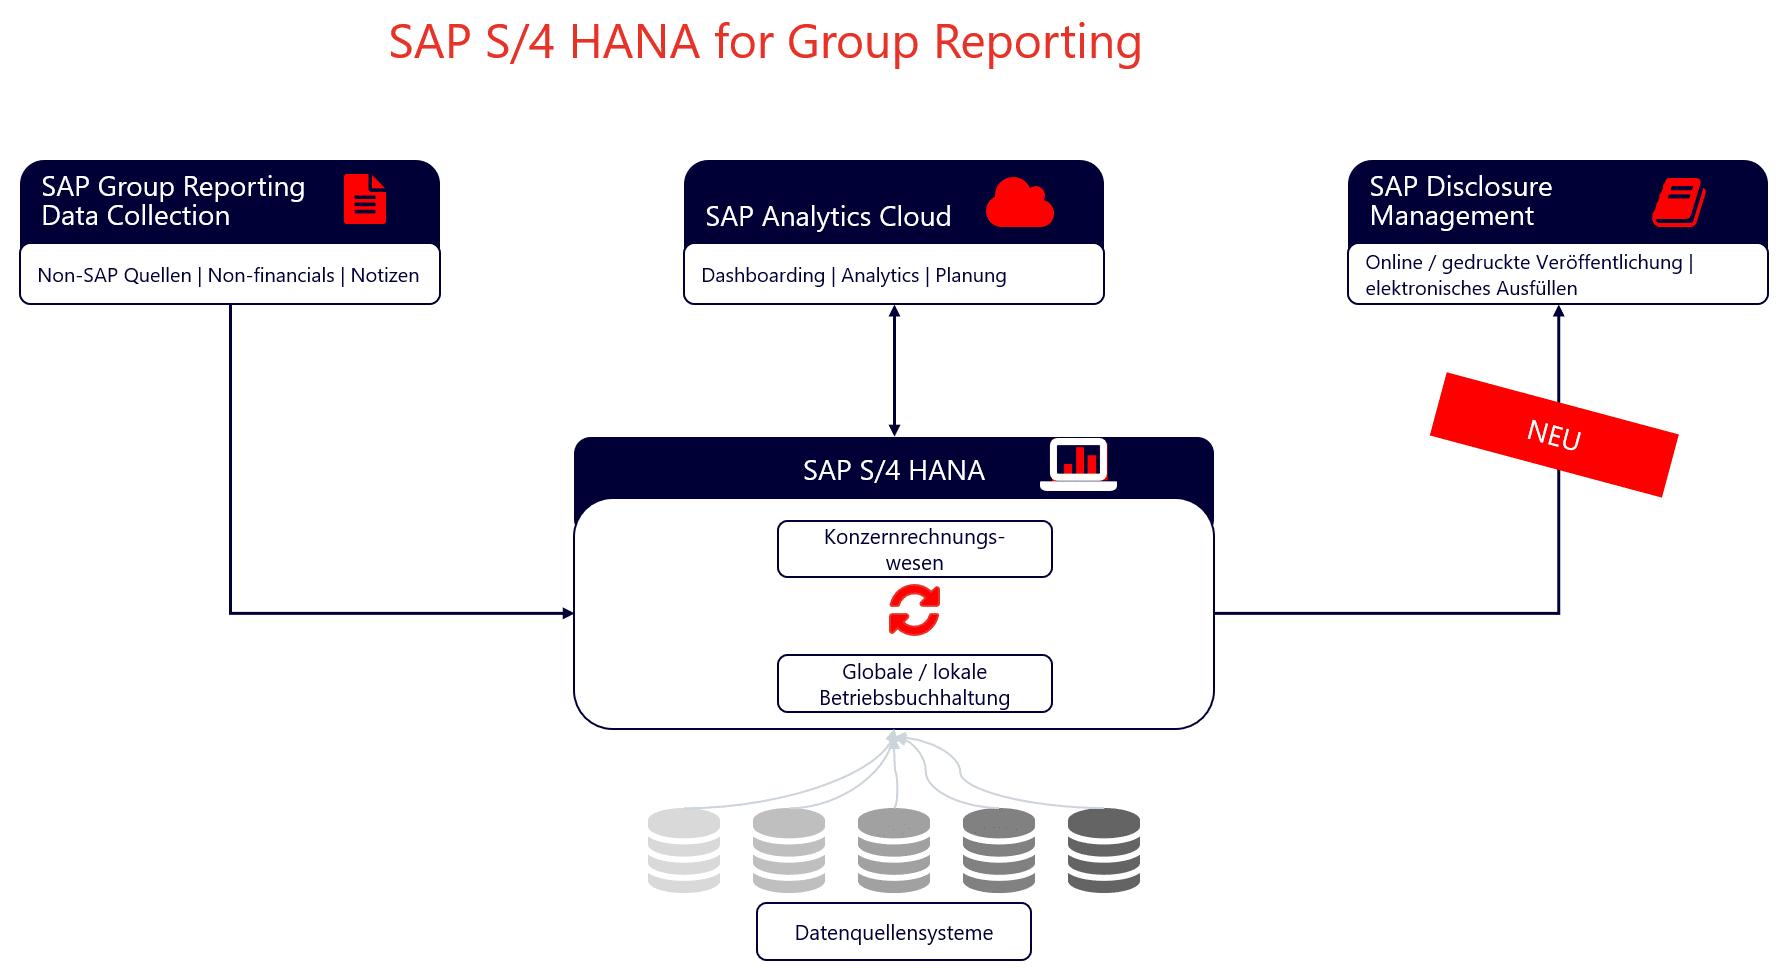 SAP S4 HANA for Group Reporting